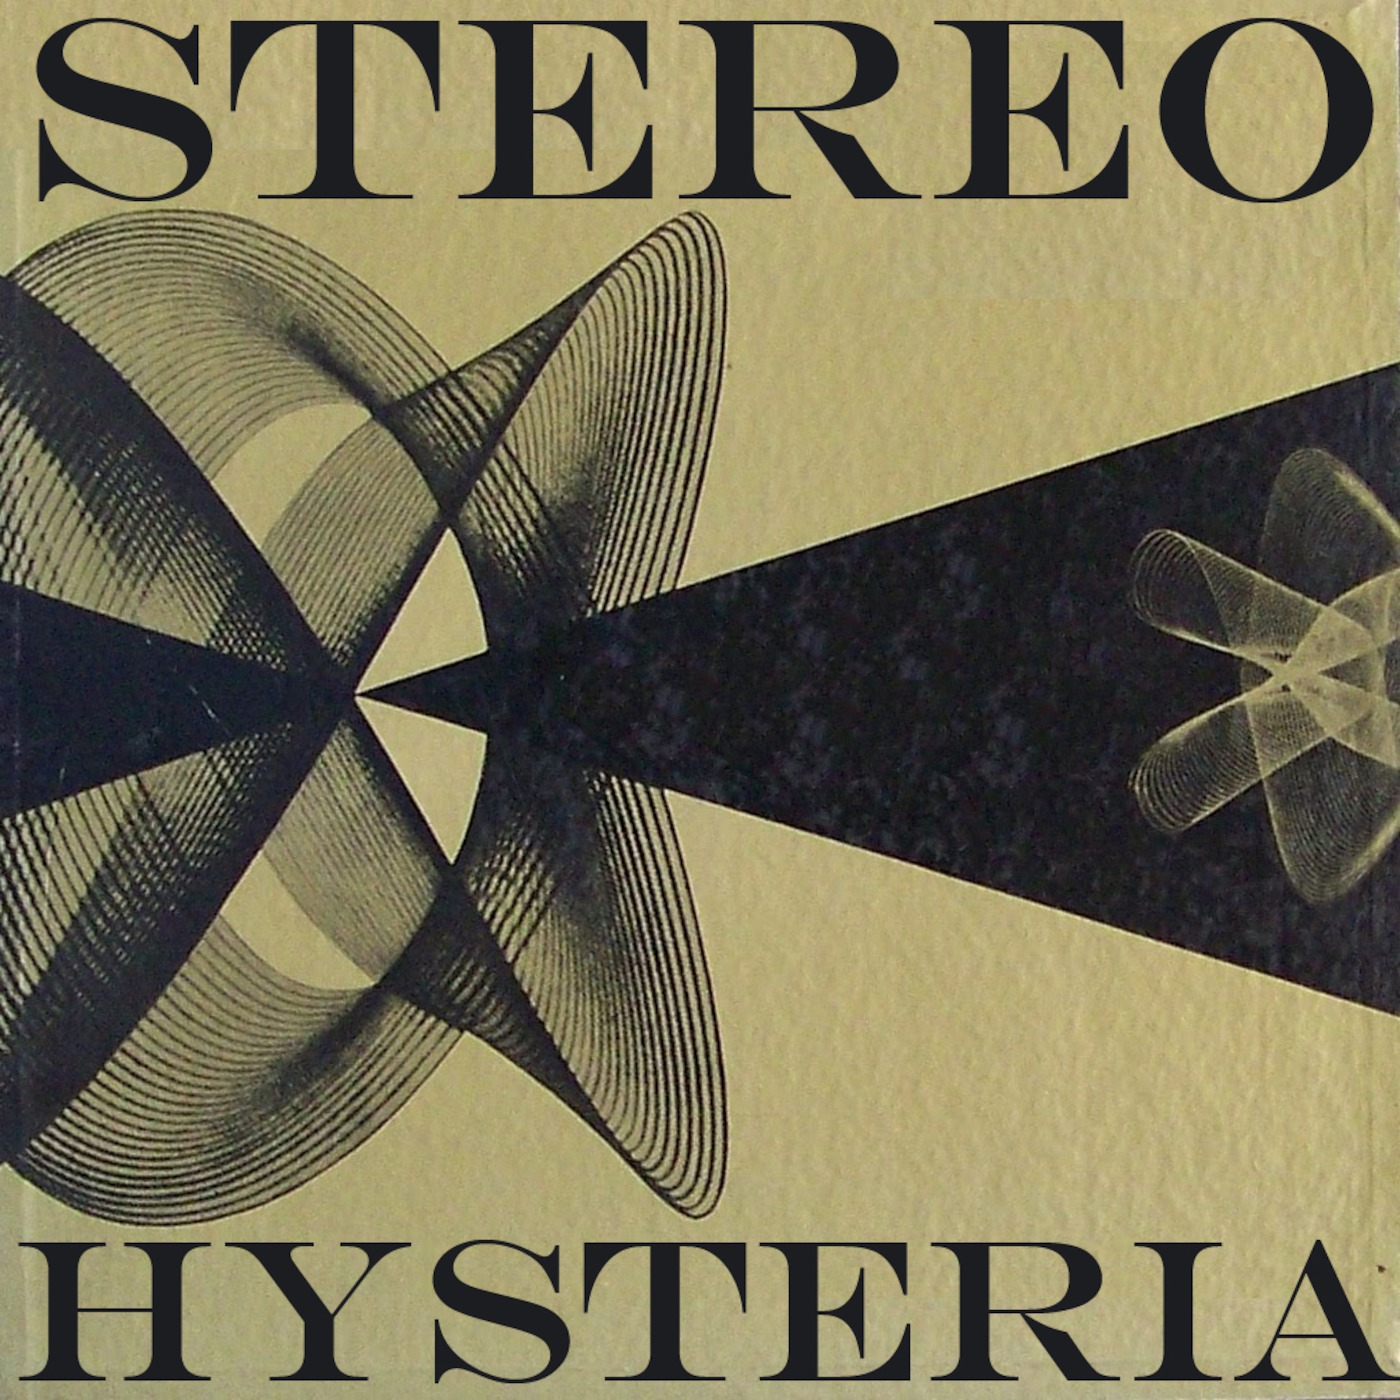 Stereo Hysteria